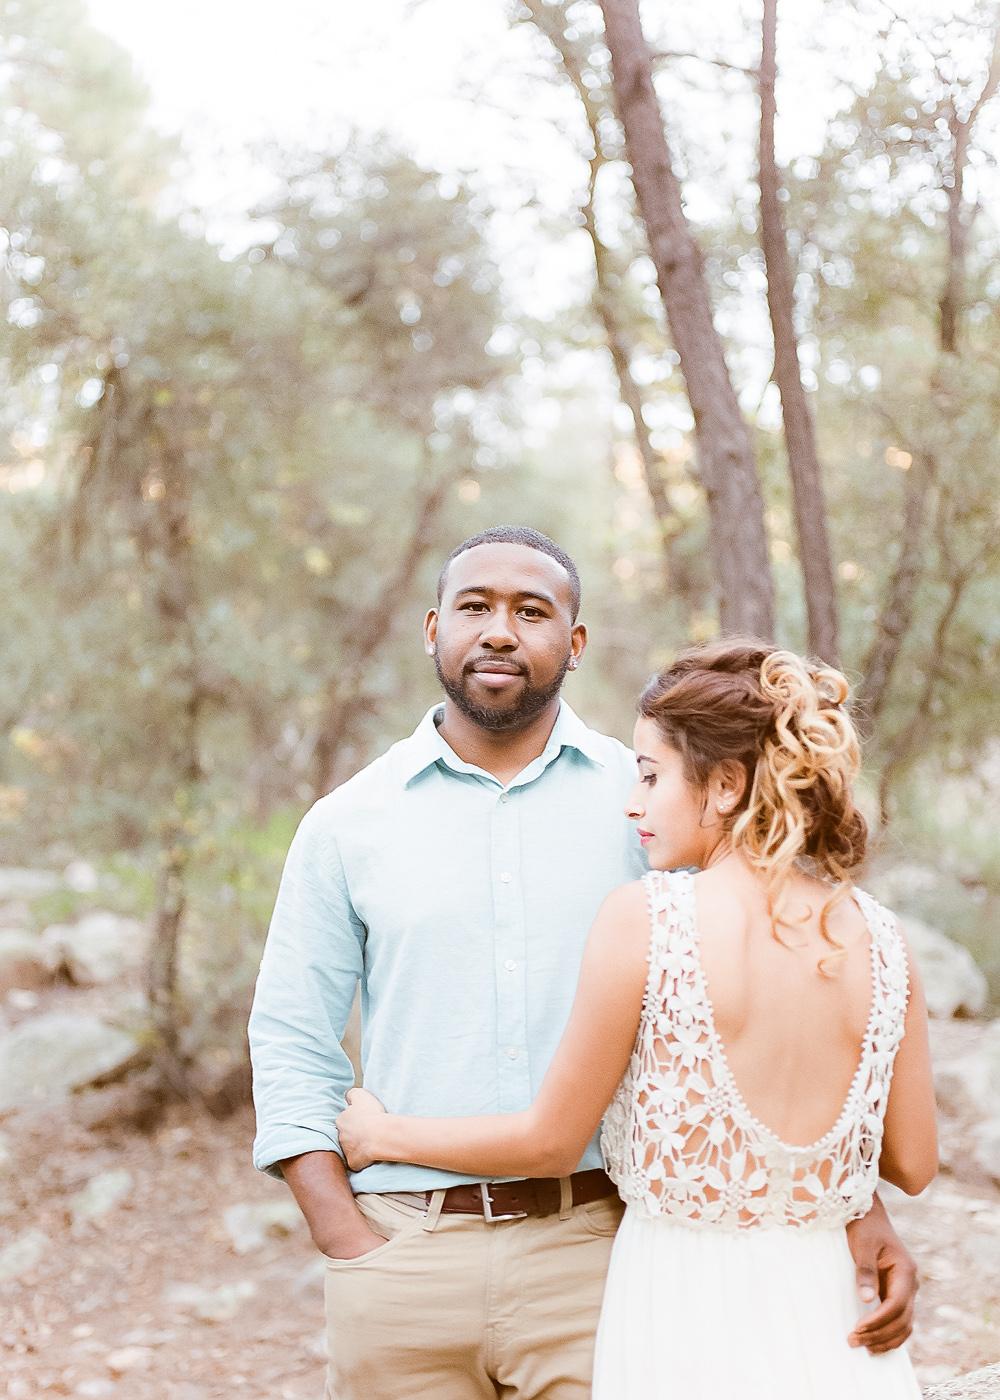 Fine Art Marriage, Anouschka Rokebrand Photography, Tuscon Arizona Anniversary